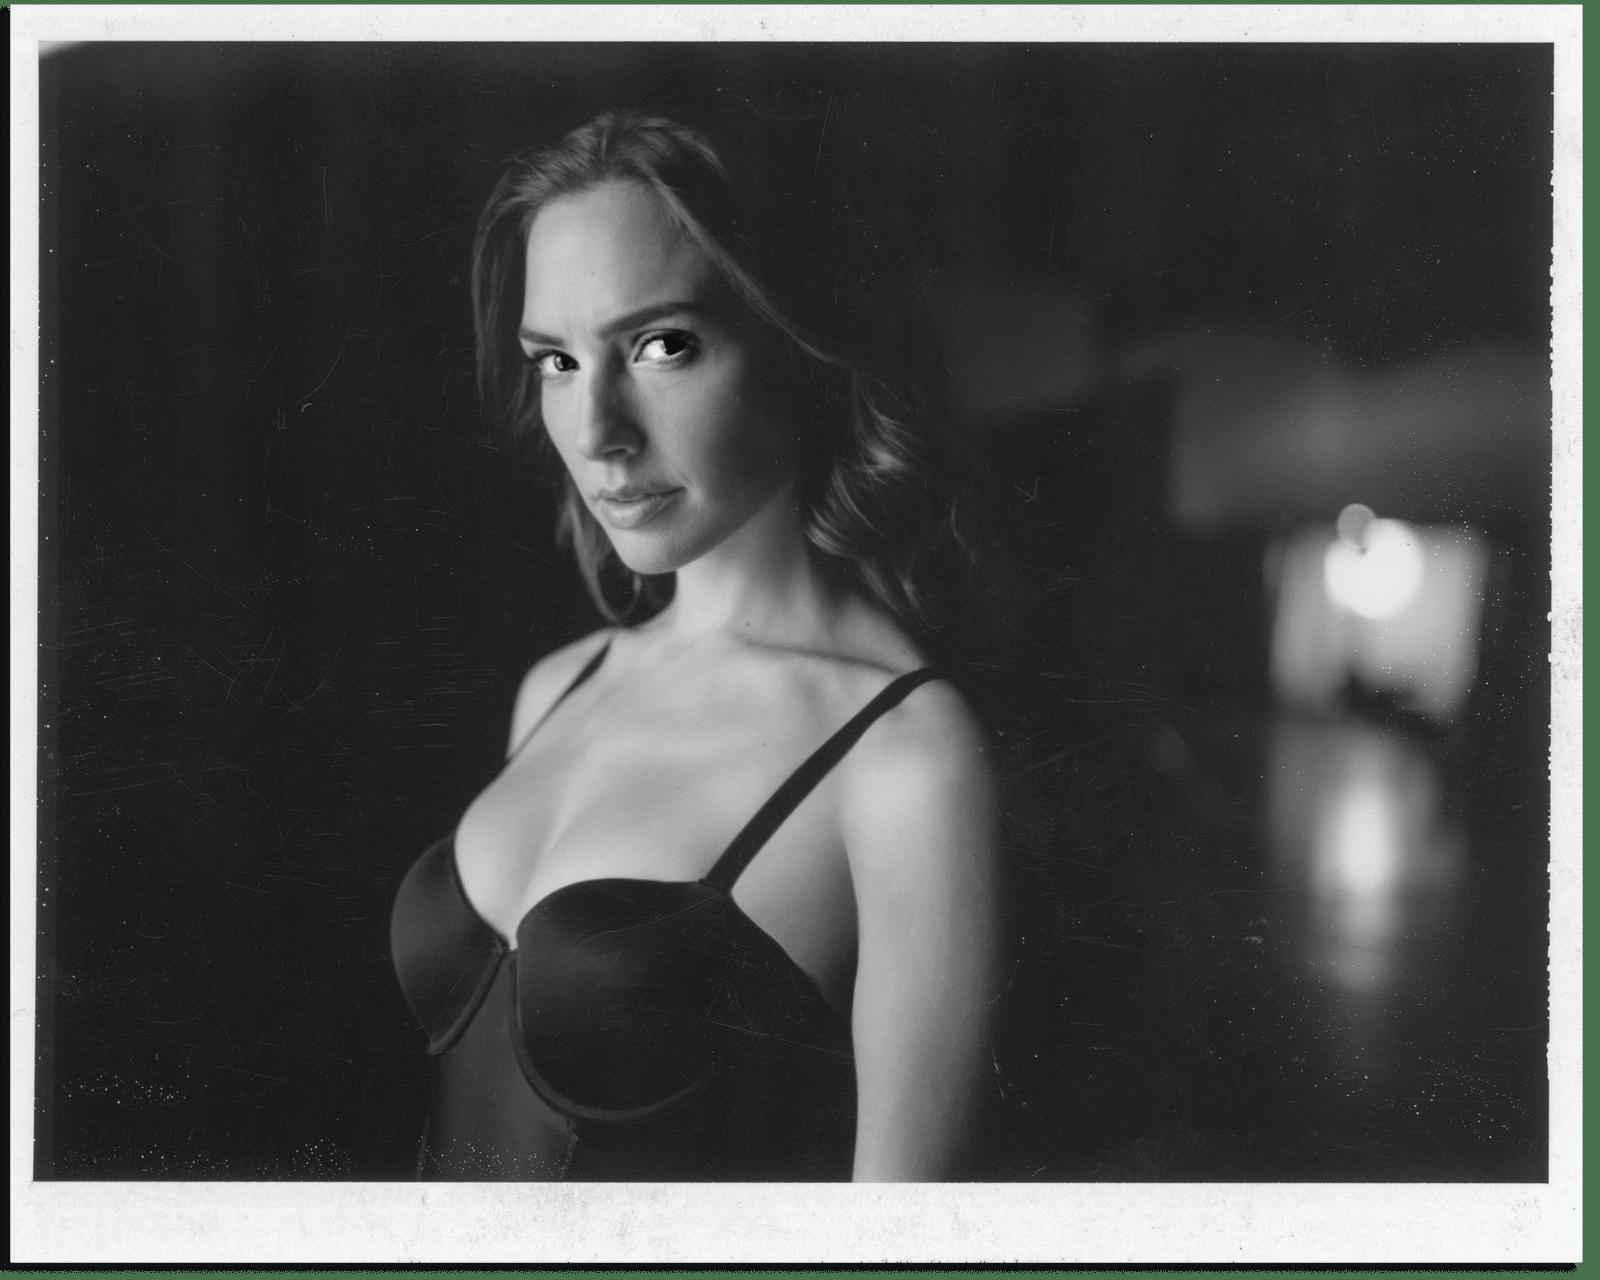 Gal Gadot fotografata da Zack Snyder